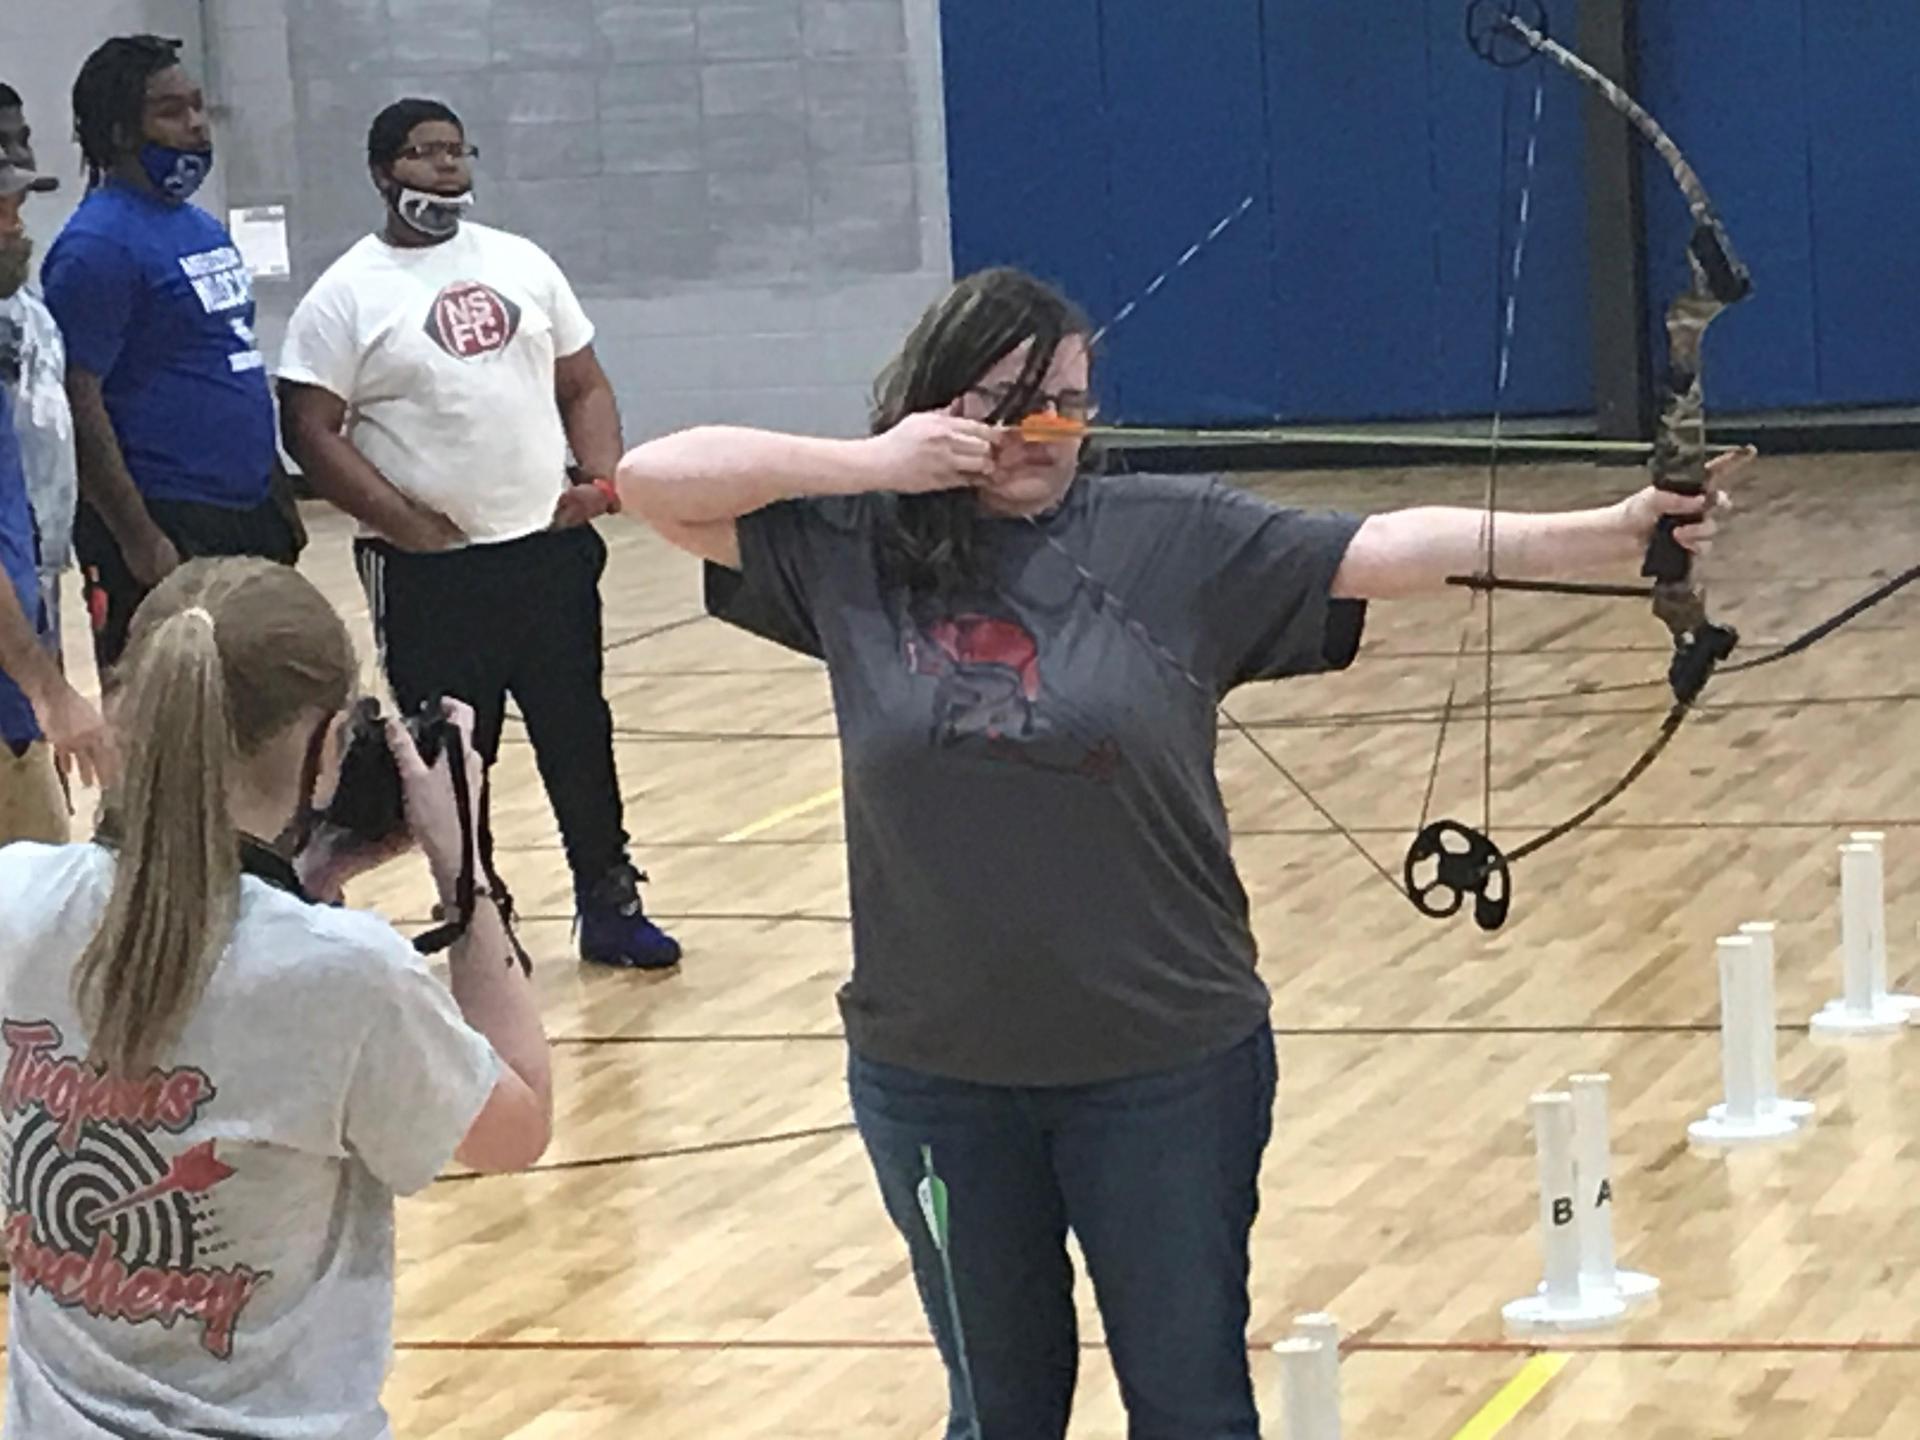 NEHS Archery Athlete